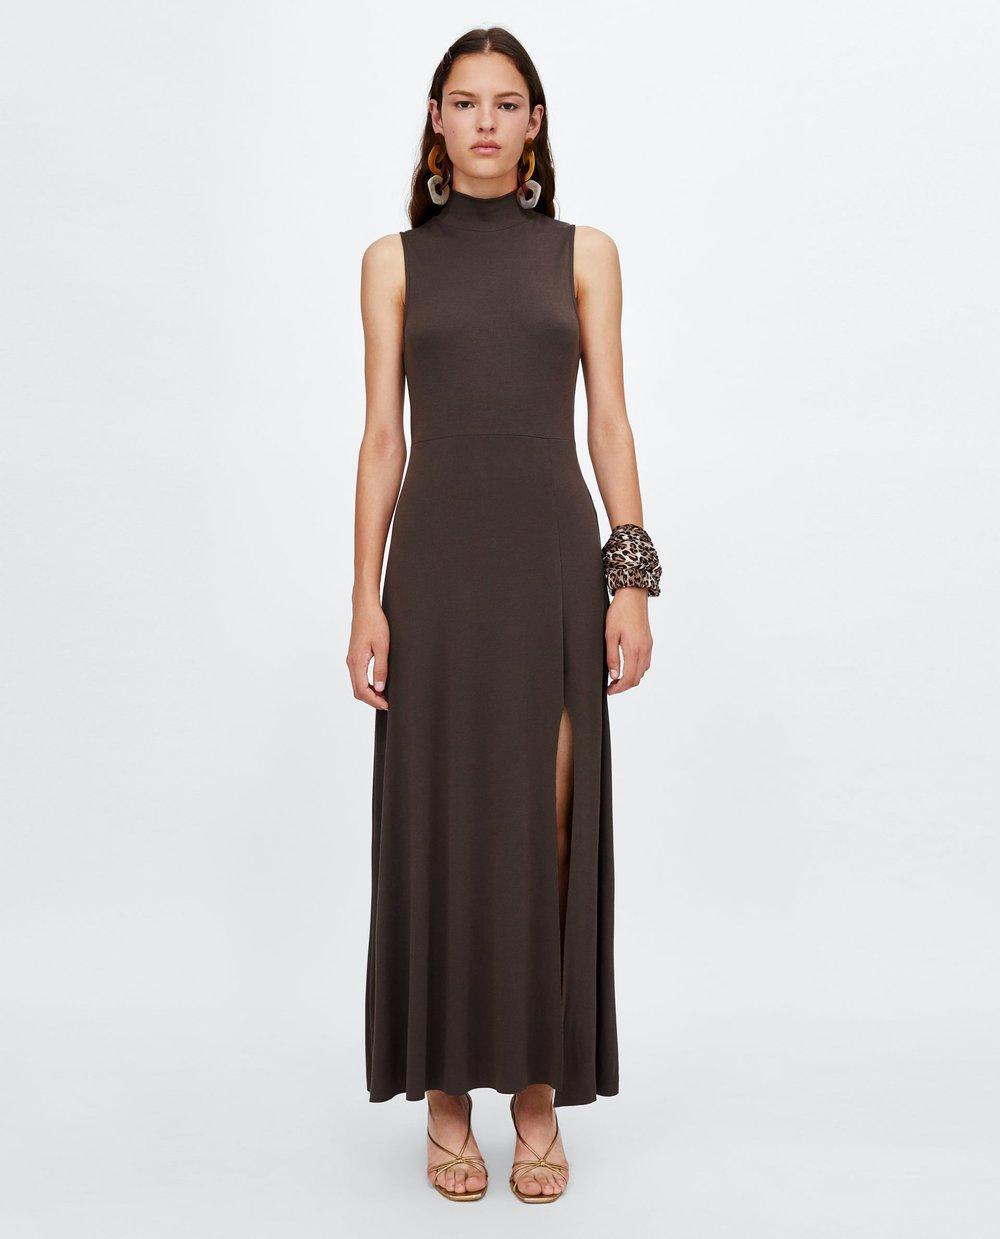 https://www.zara.com/ca/en/flowy-high-neck-dress-p00264626.html?v1=6594096&v2=1074660